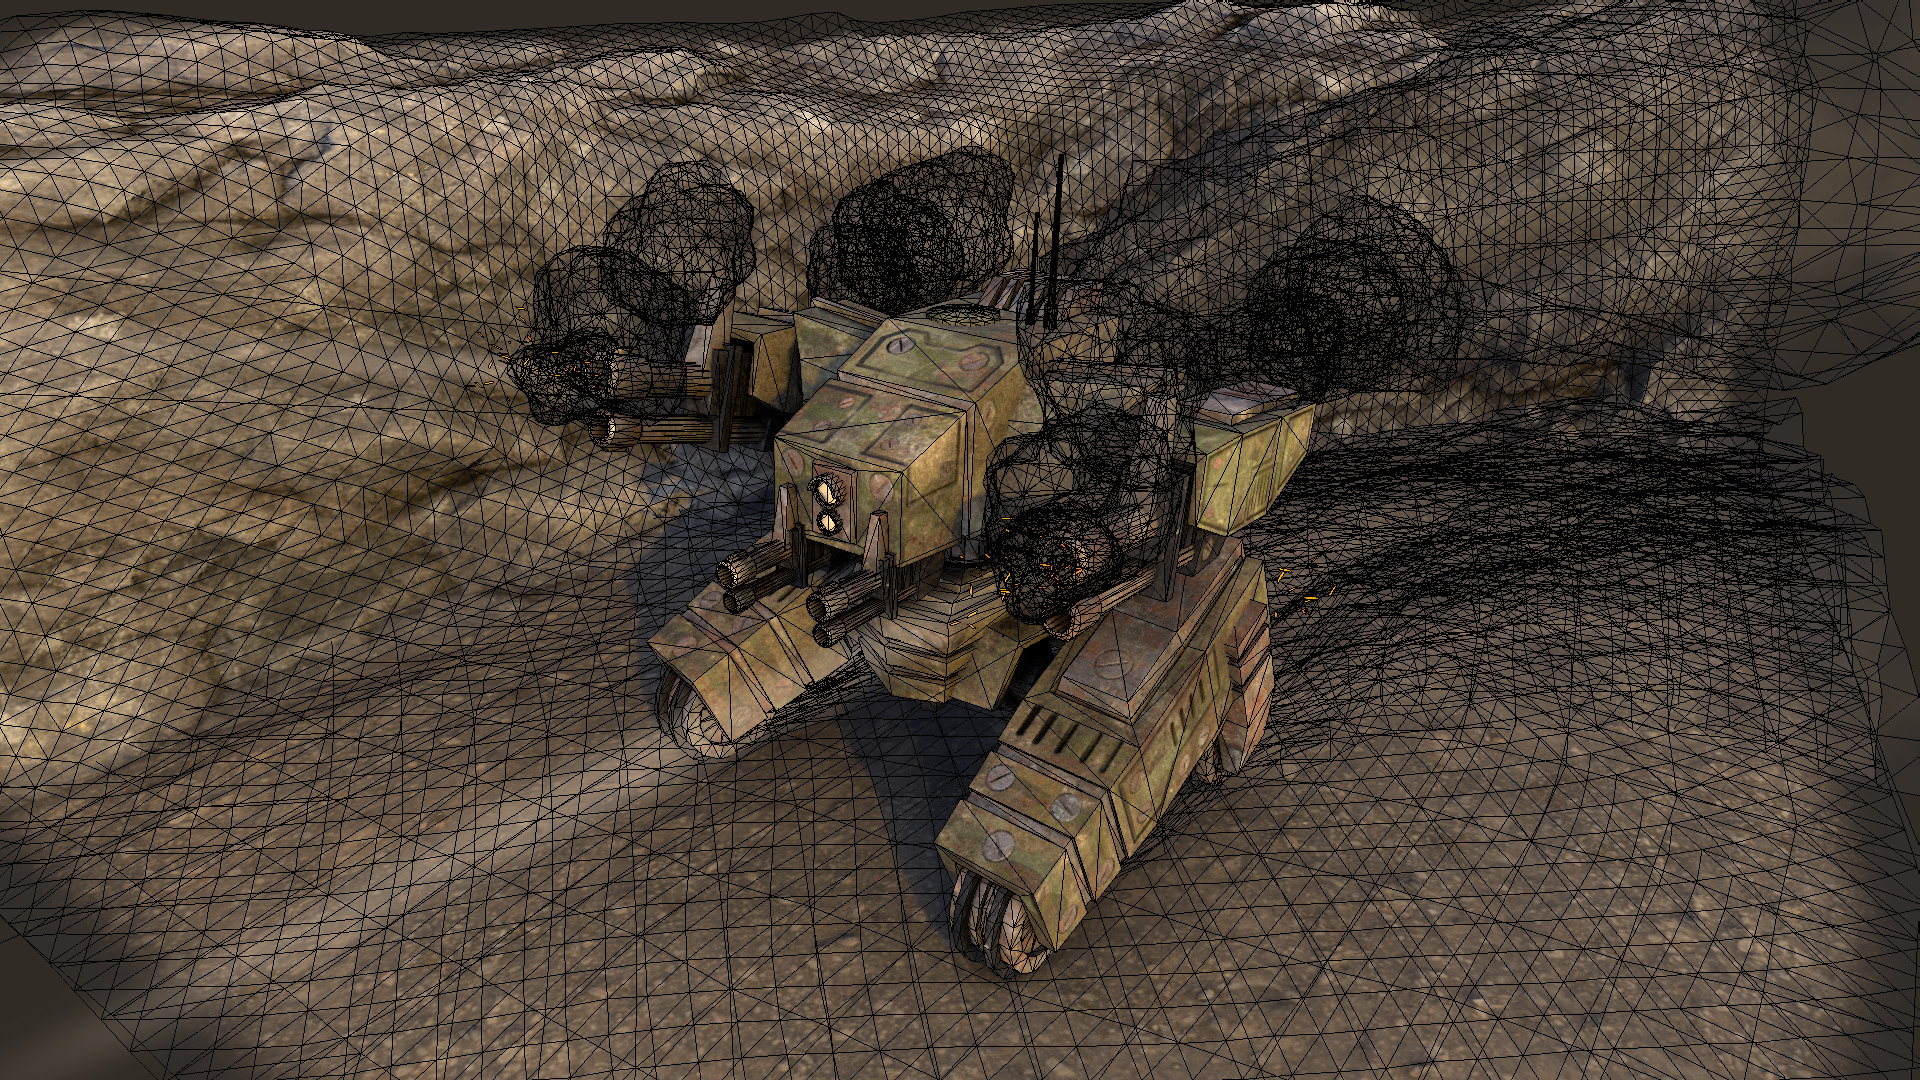 Ivan batalla sci fi war tank 4